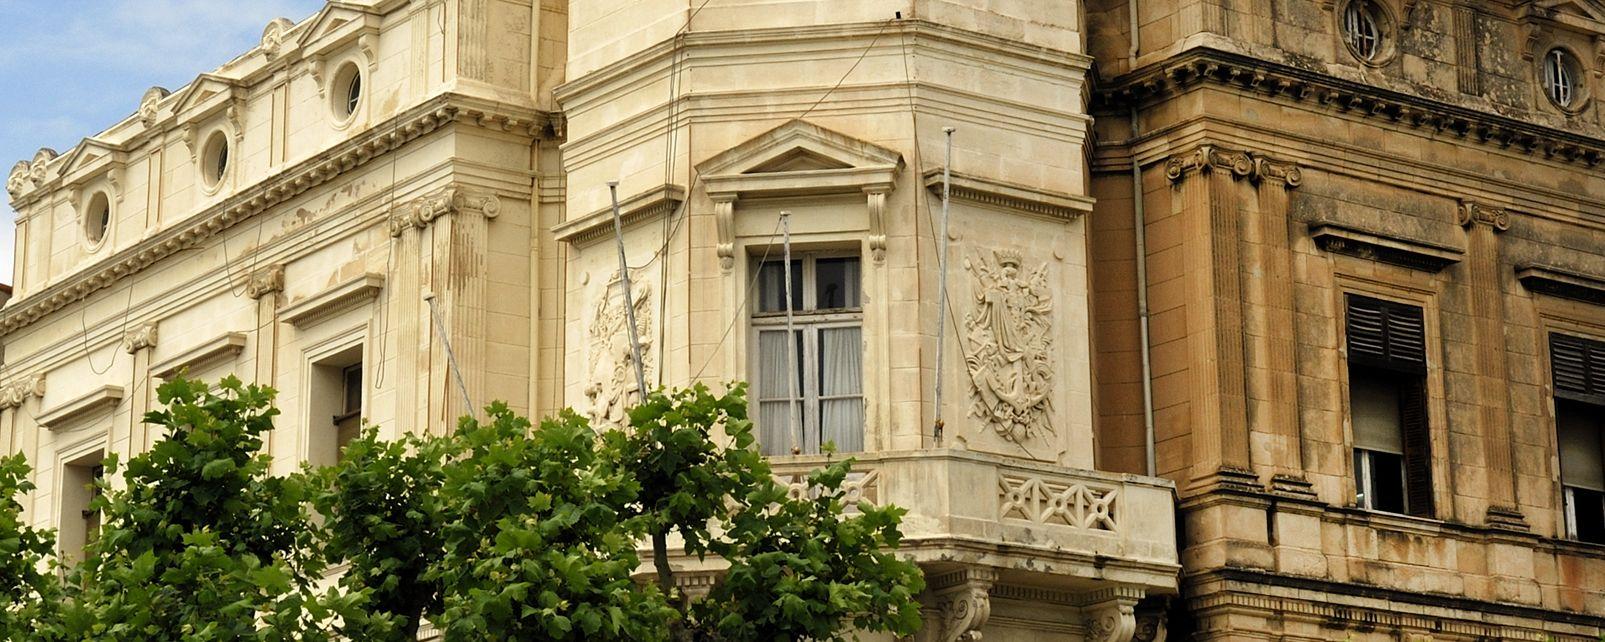 Ciotaden Museum, Musée Ciotaden, Arts and culture, Provence-Alpes-Côte d'Azur